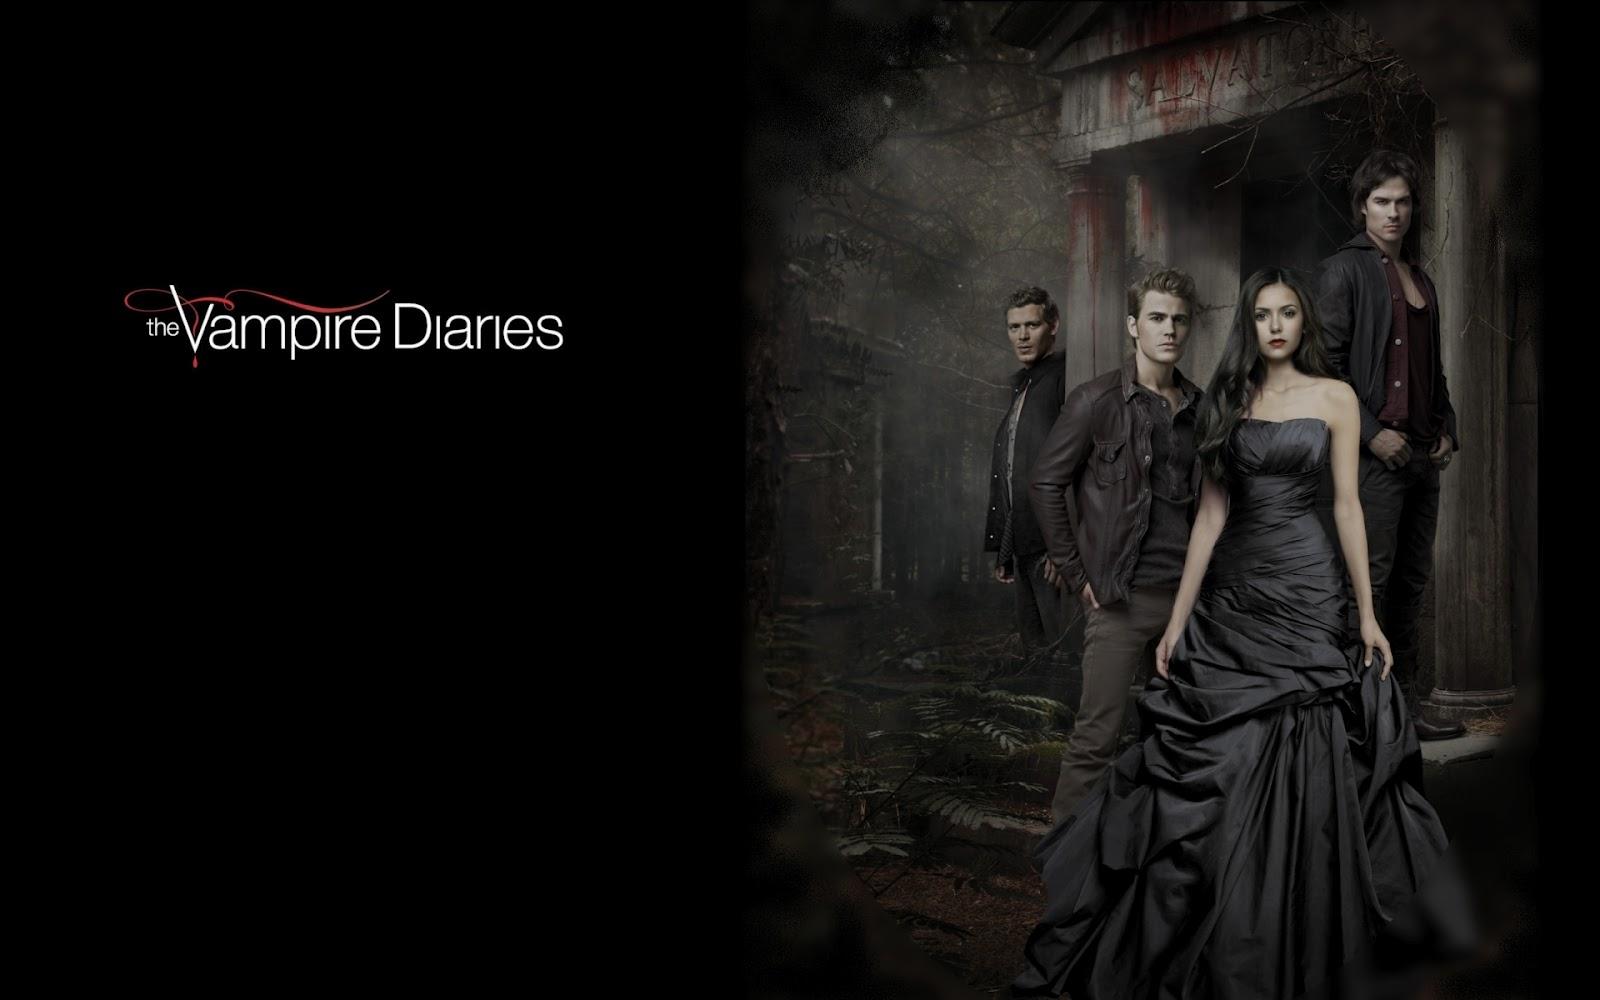 Vampire Diaries Wallpaper , HD Wallpaper & Backgrounds